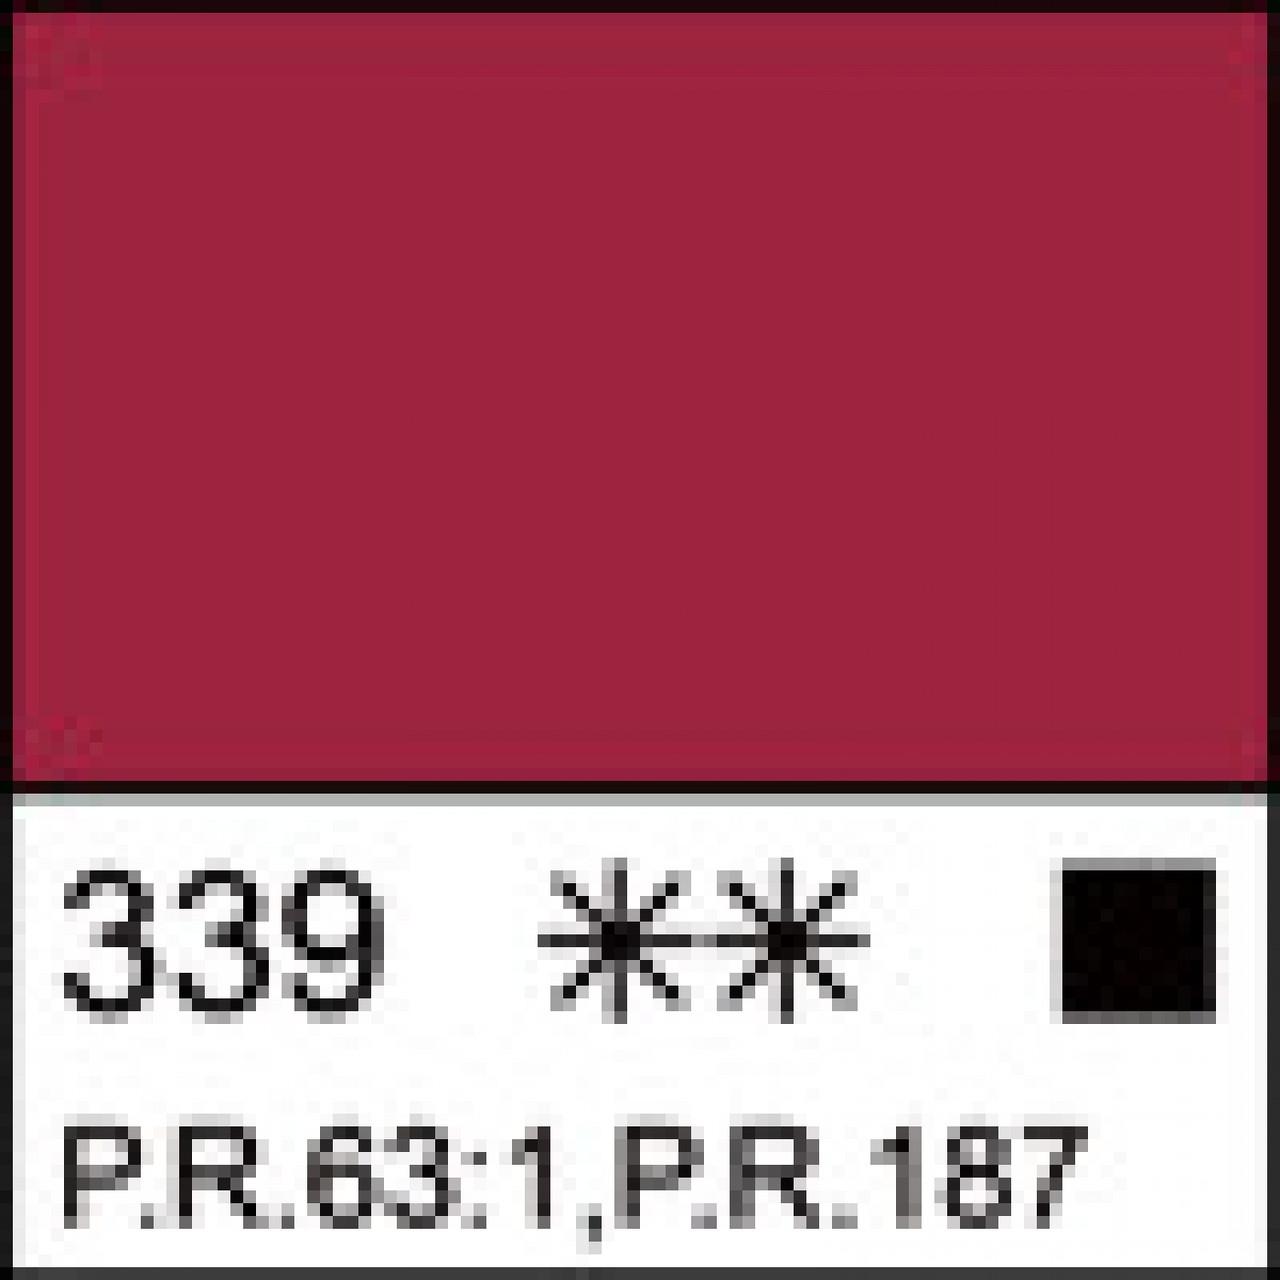 Краска гуашевая МАСТЕР-КЛАСС, краплак красный, 100мл ЗХК